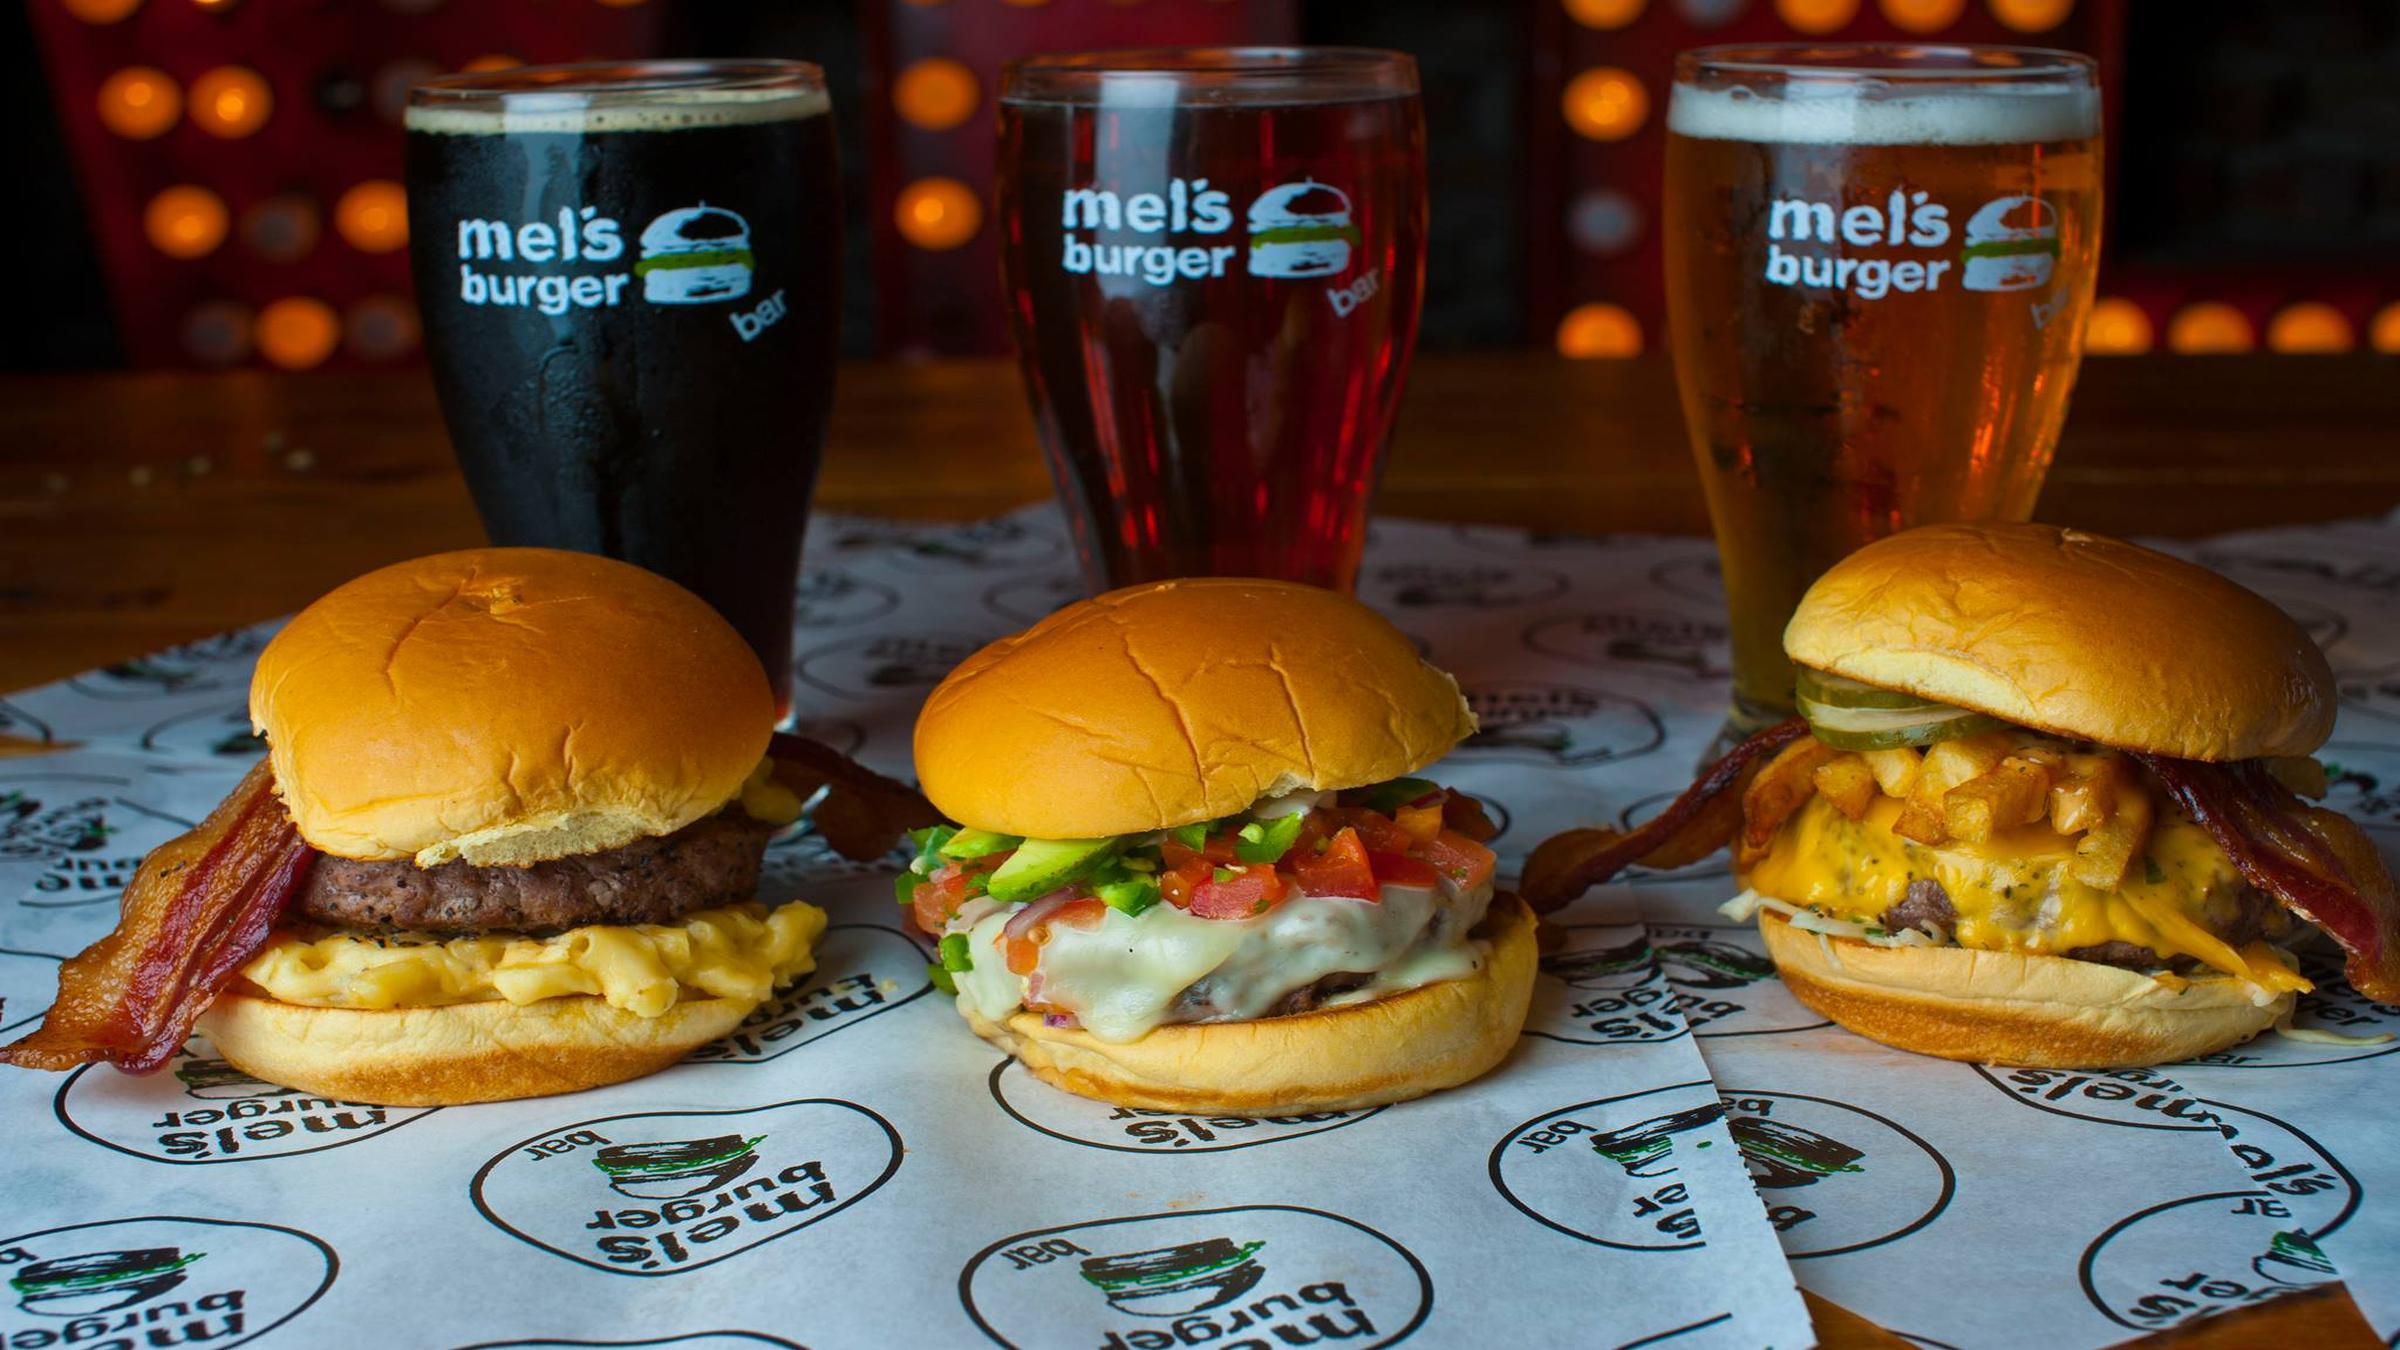 Mel's Burger Bar Brand Cover